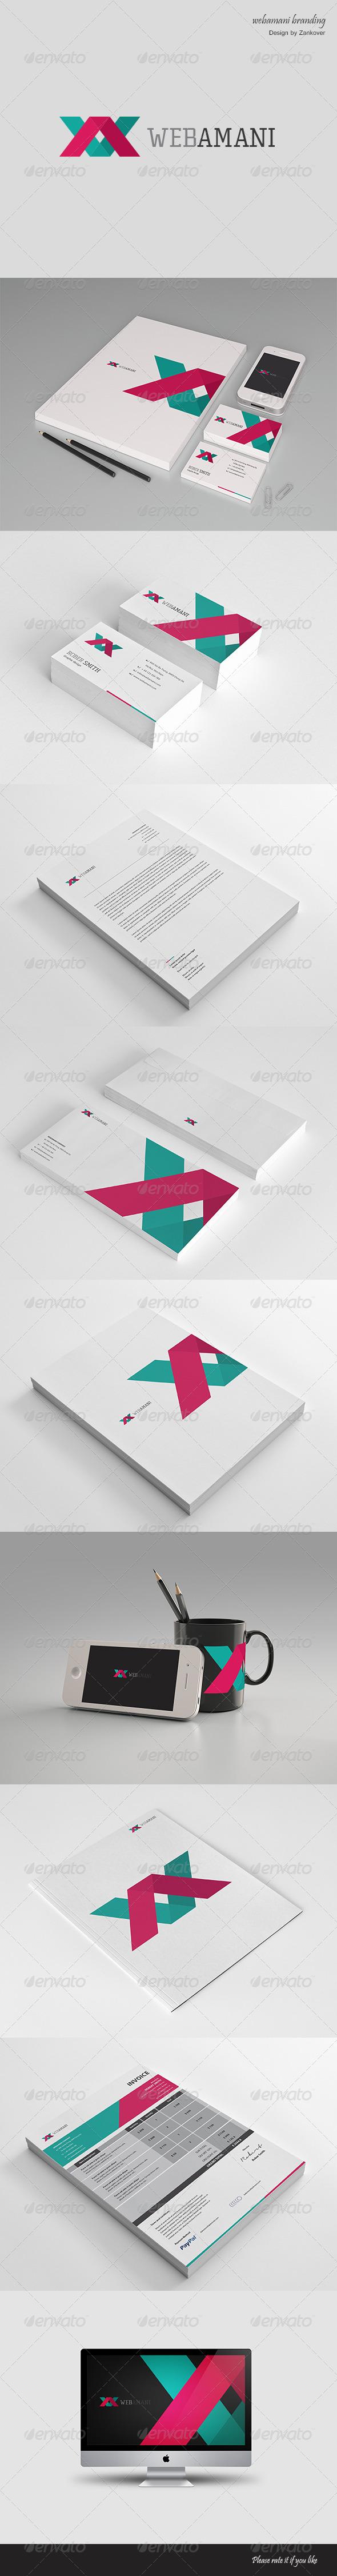 Webamani - Modern Stationary + Invoice - Stationery Print Templates